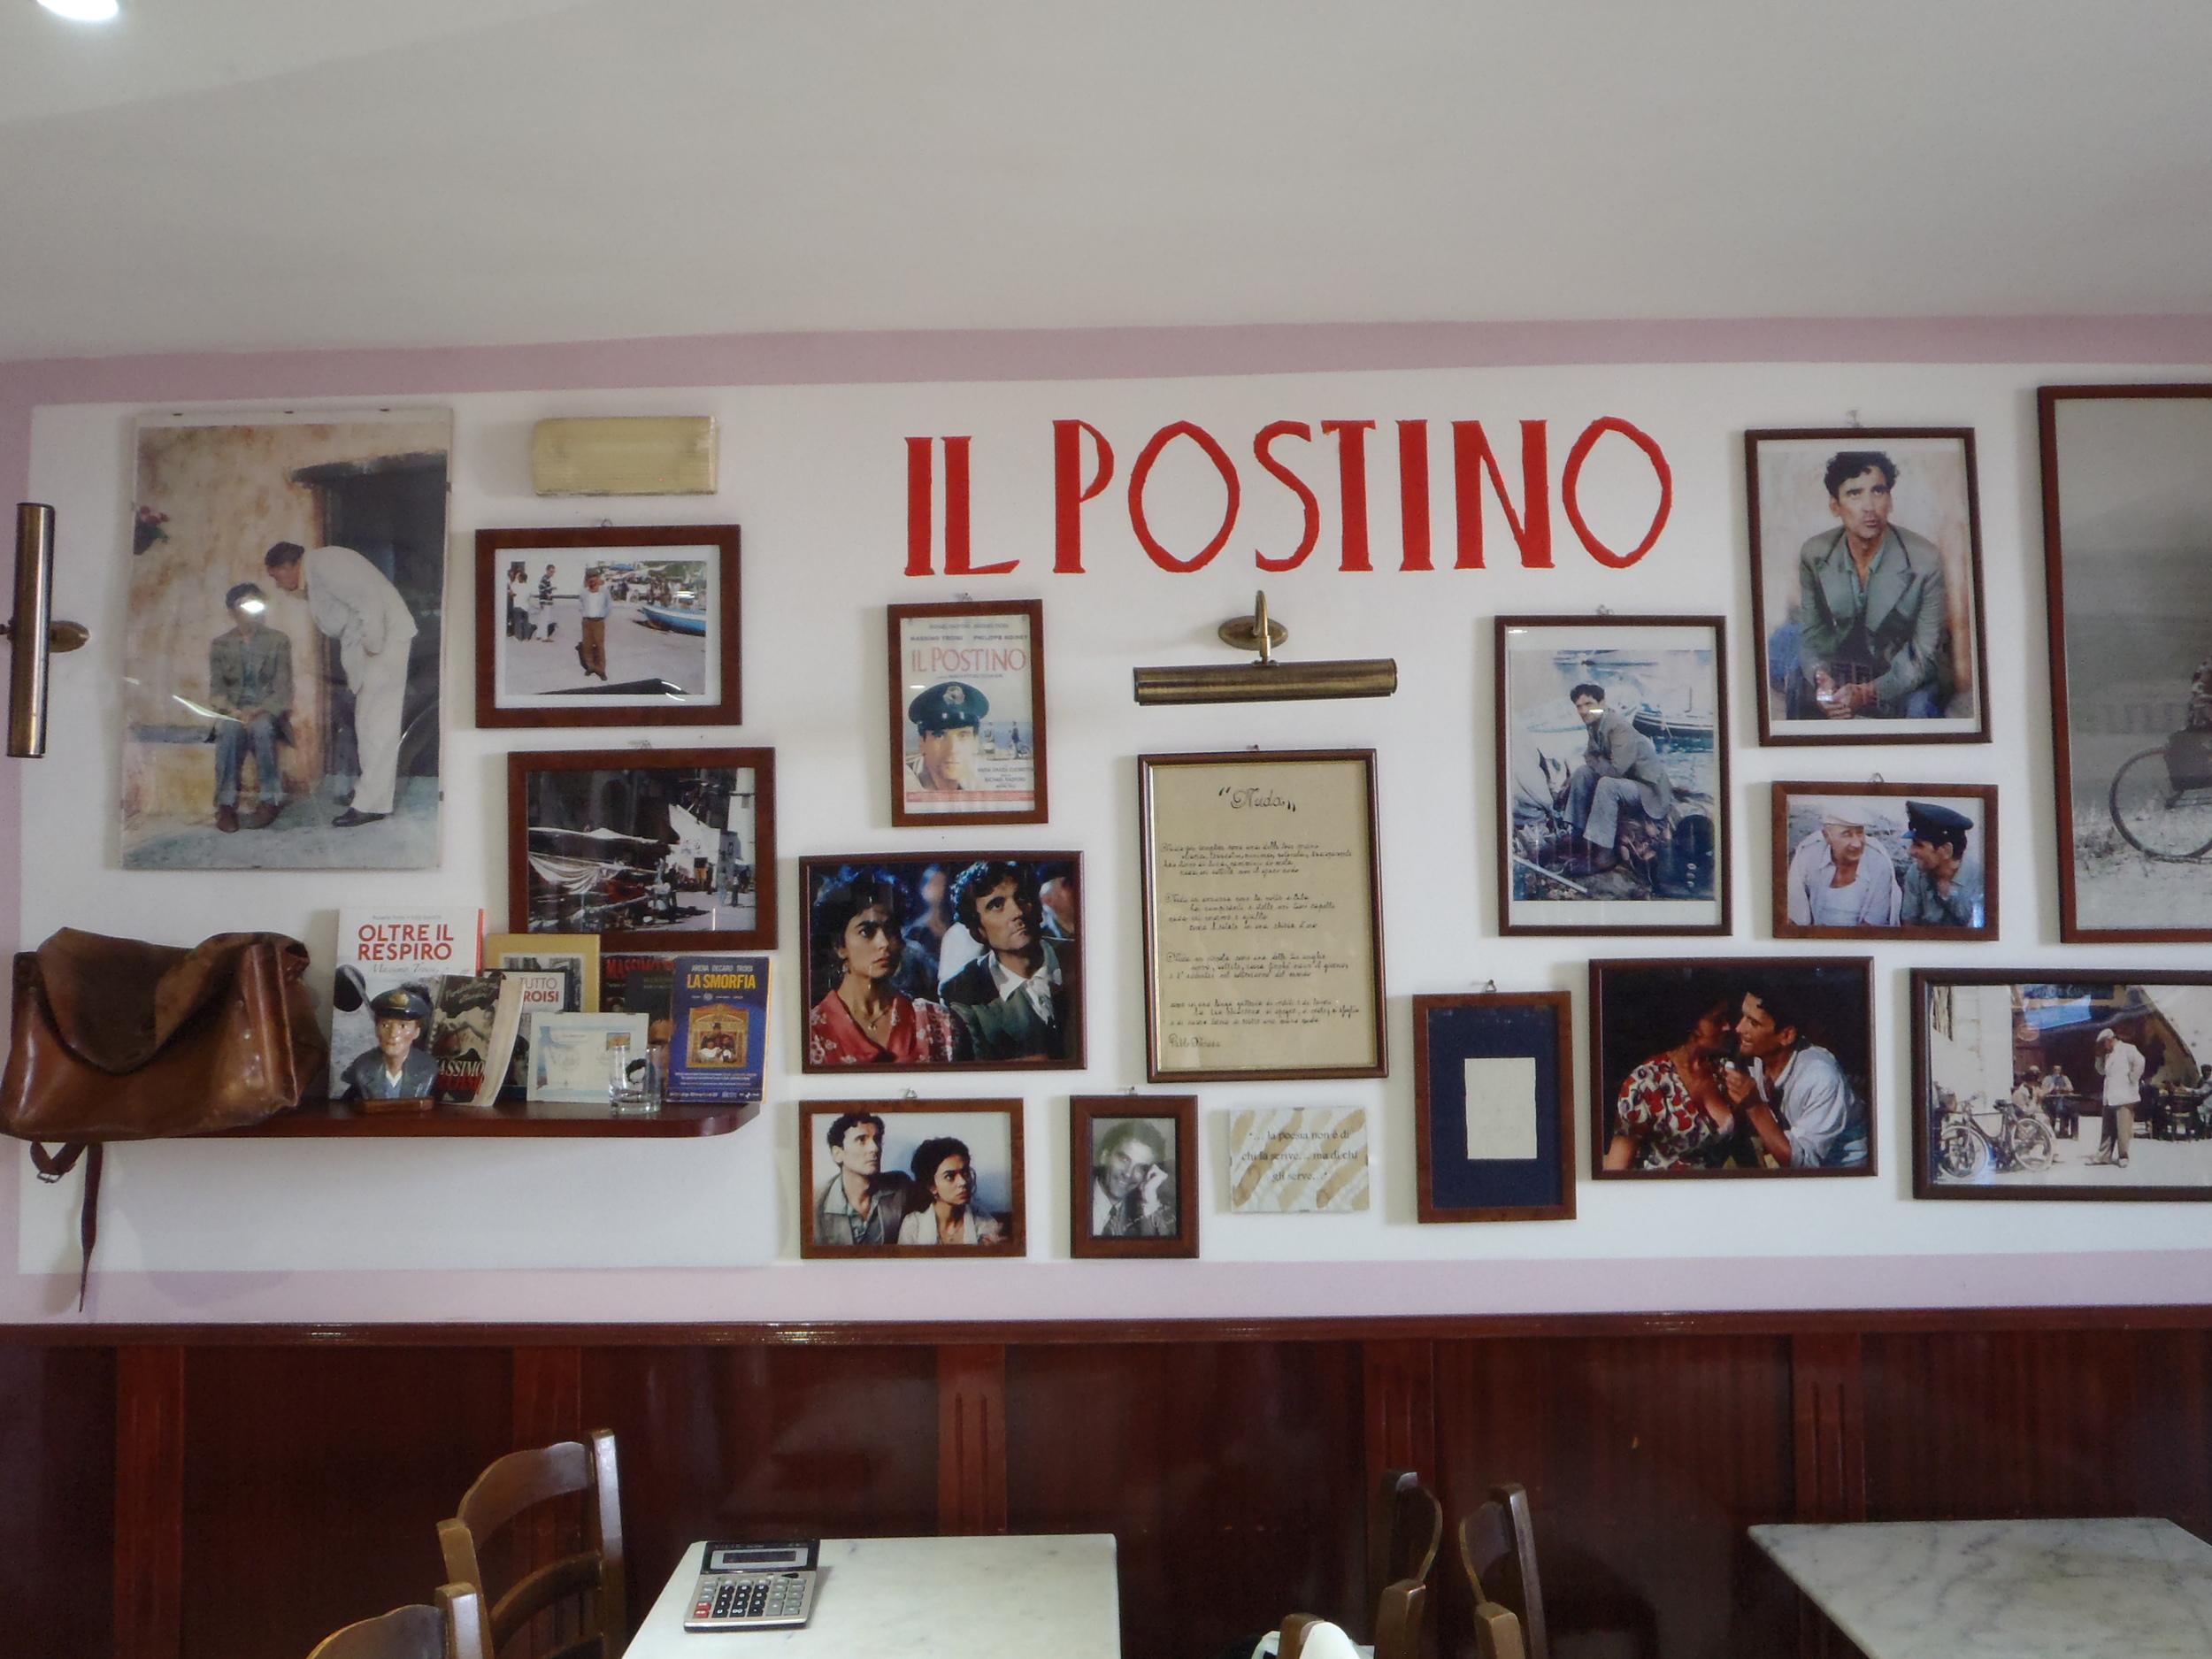 CRO Italy web 2013 - 096.JPG